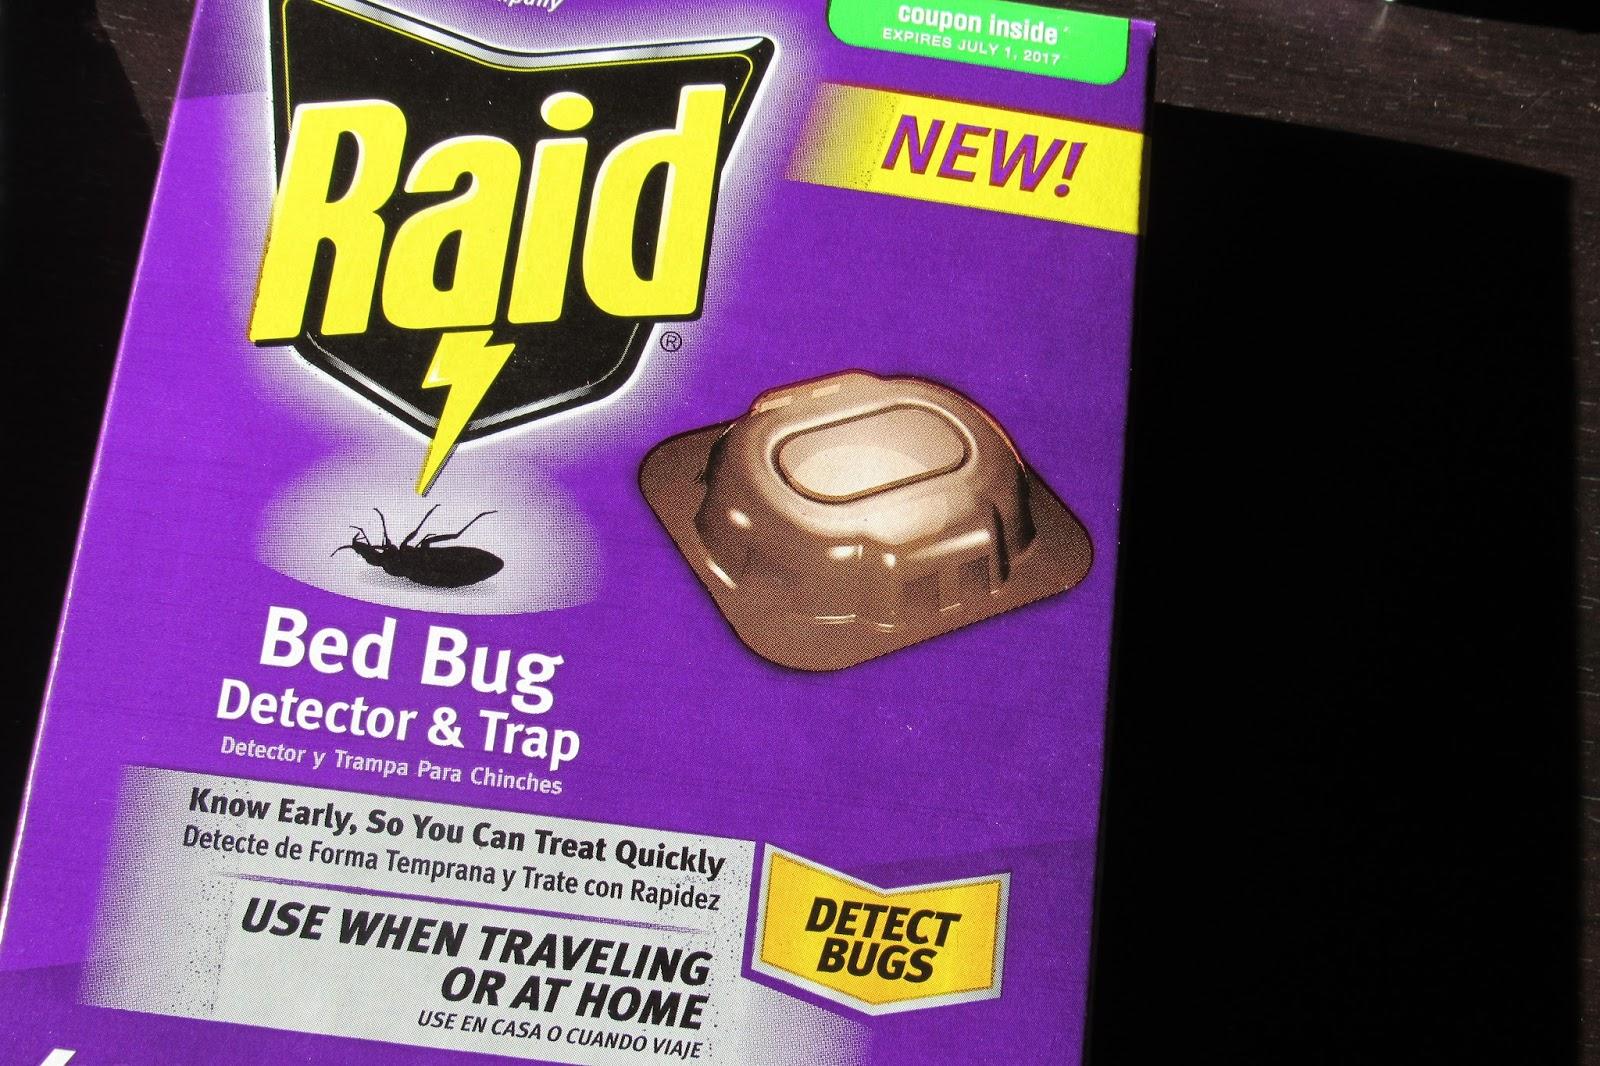 health ct personal dp com trap raid detector care amazon bug bed